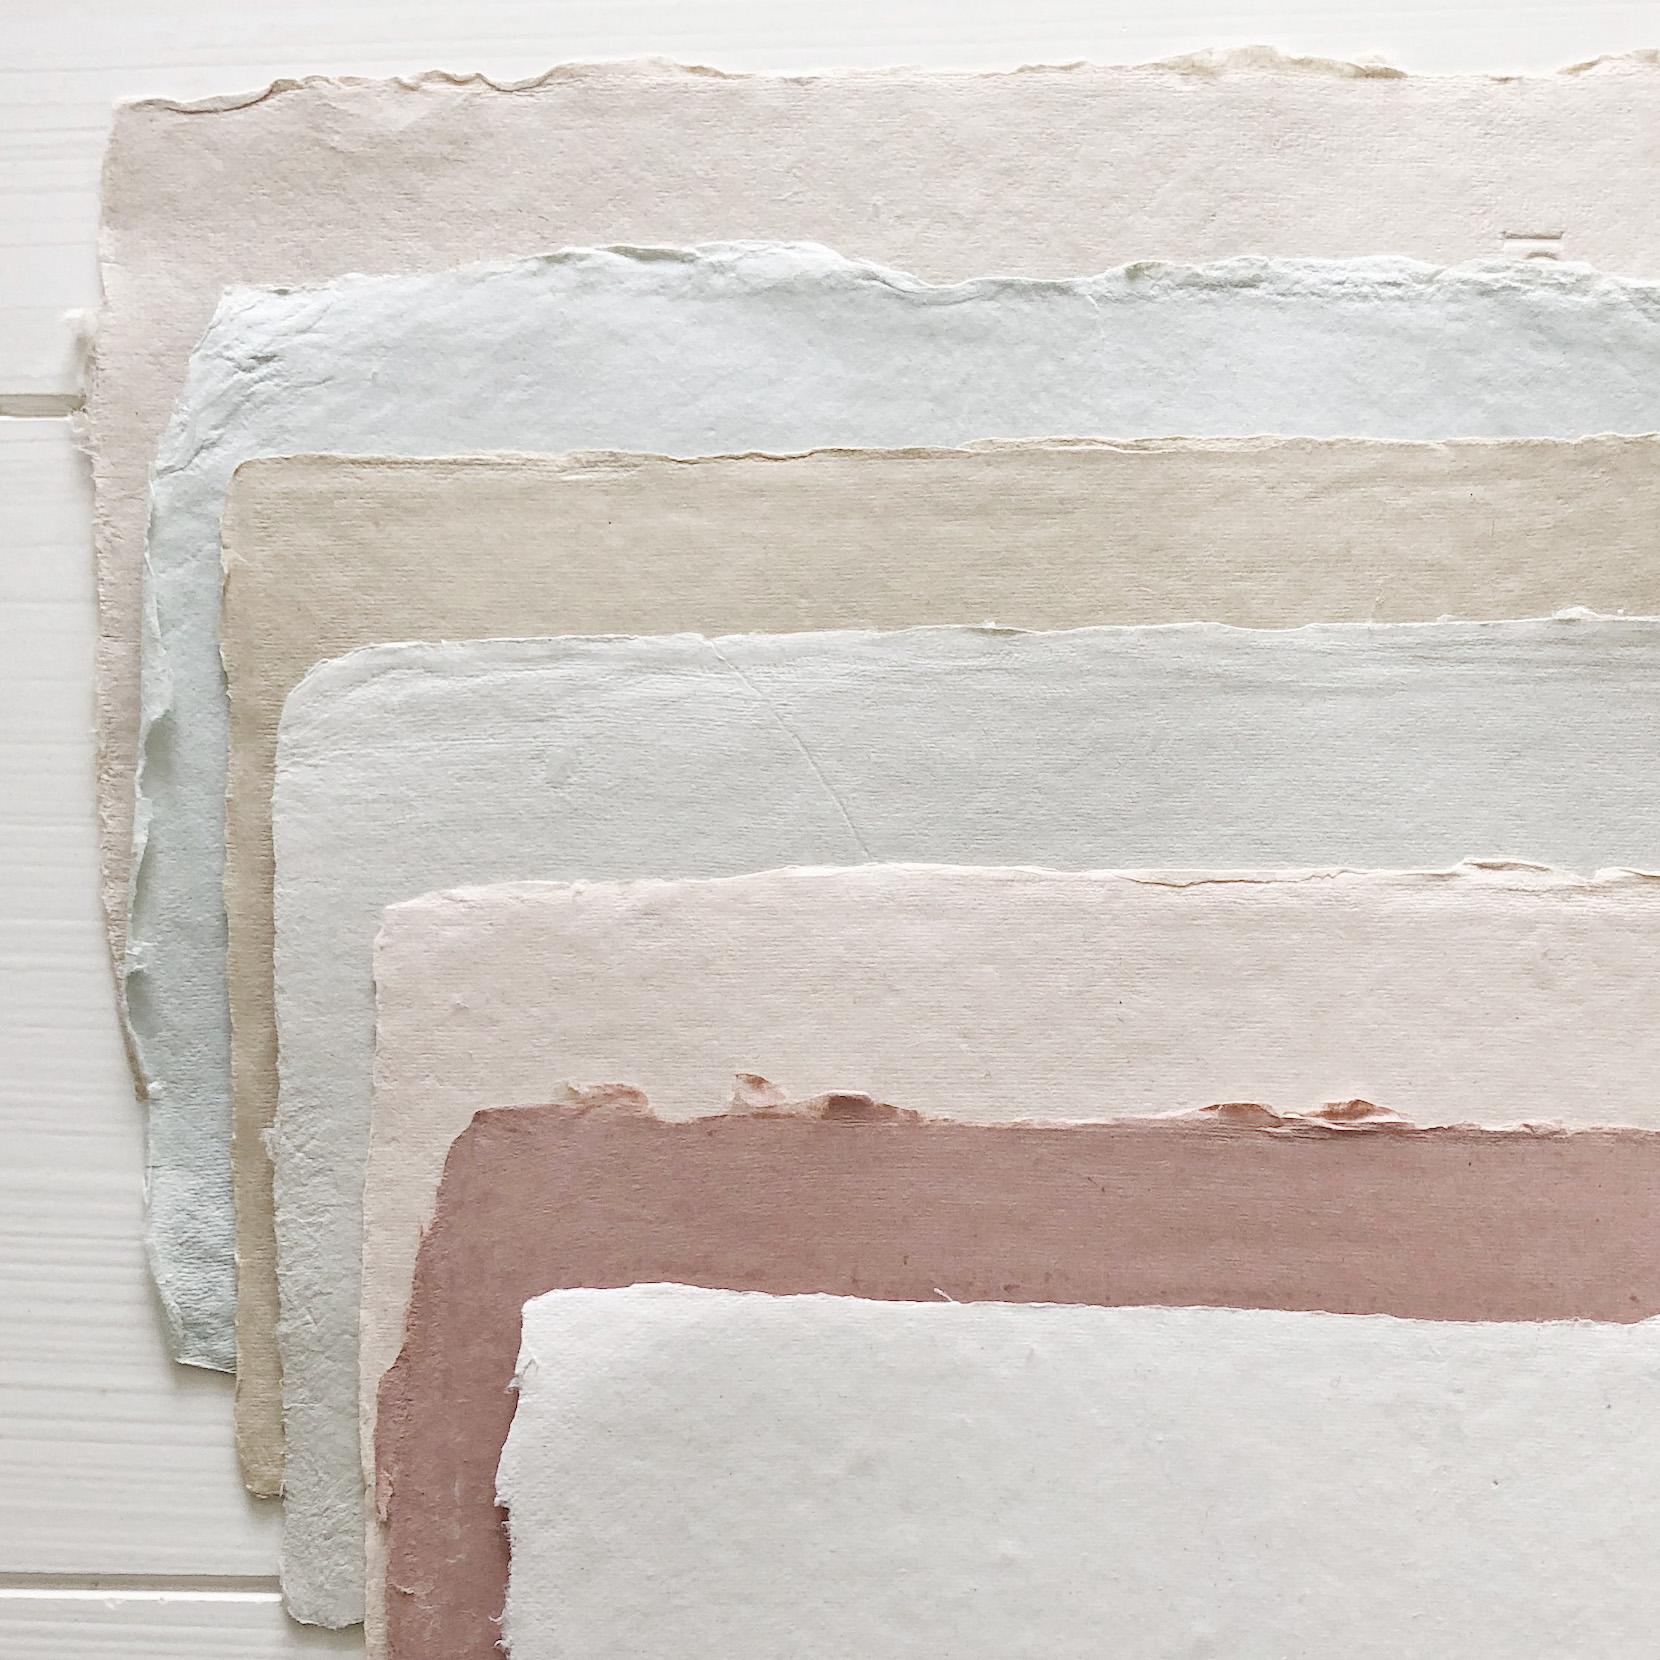 handmade envelope colors    from the top: Sand, Lake, Wheat, Haze, Powder, Rose, Cream